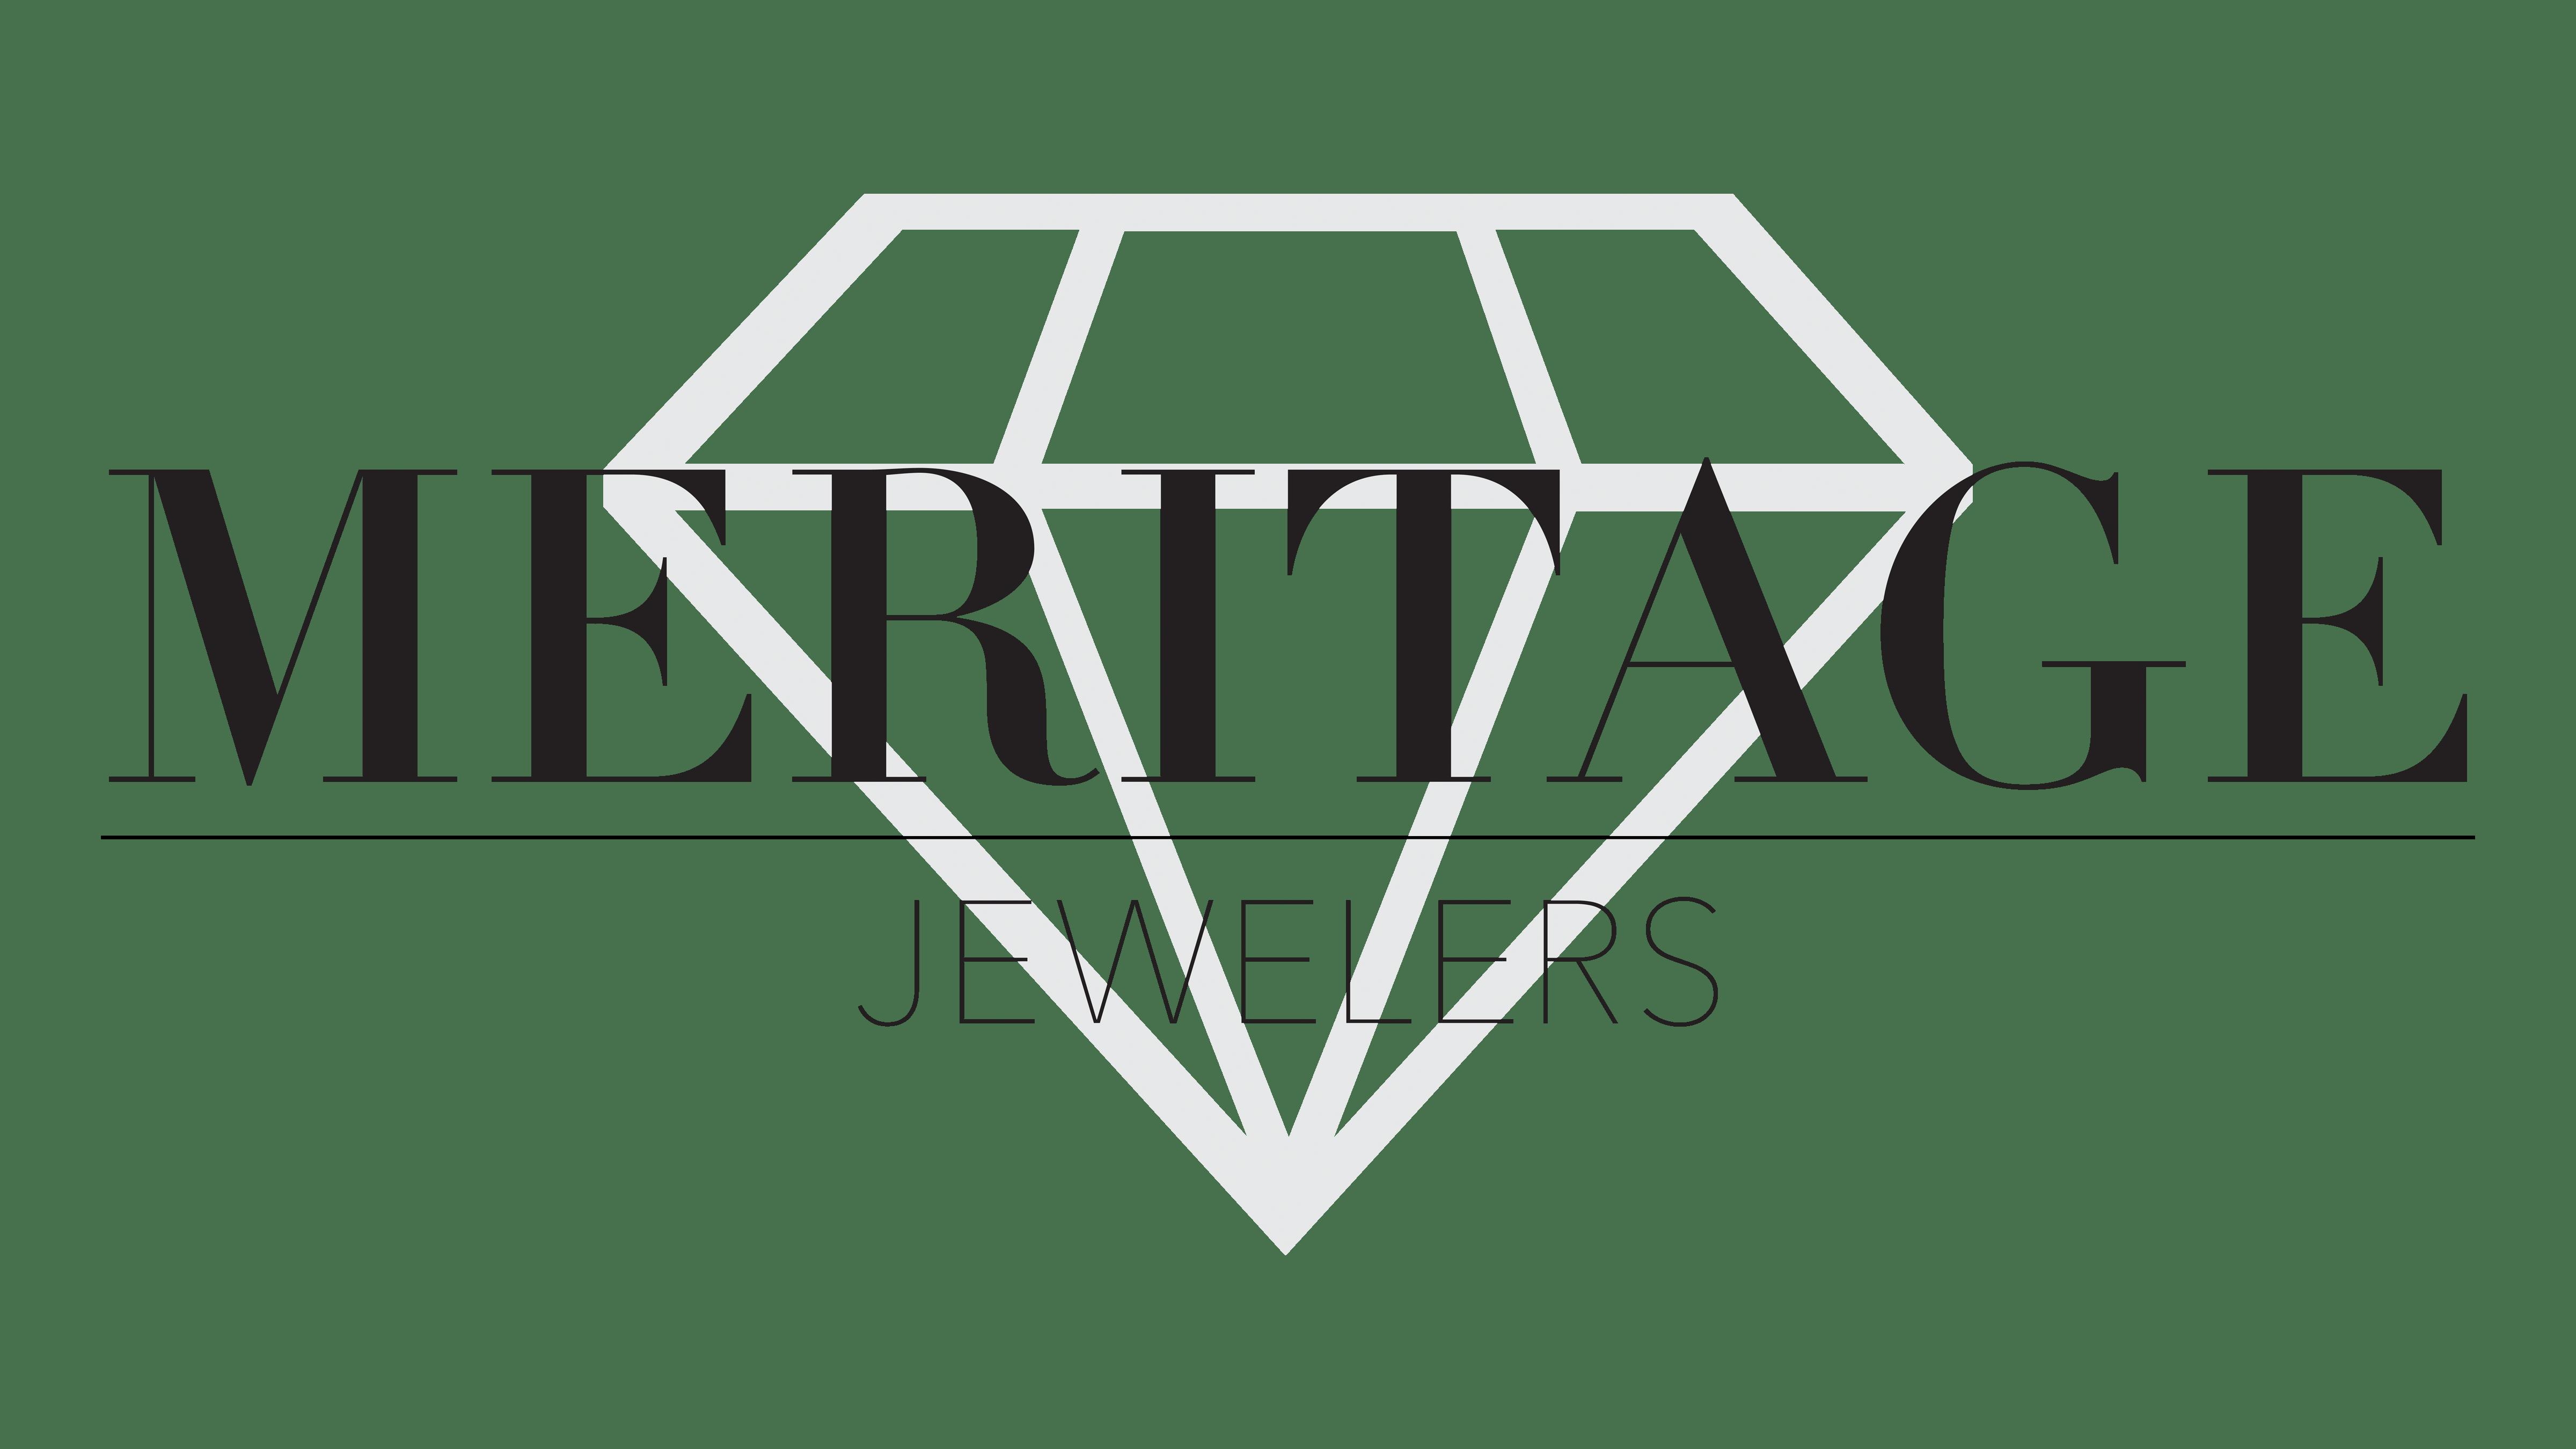 Meritage Jewelers